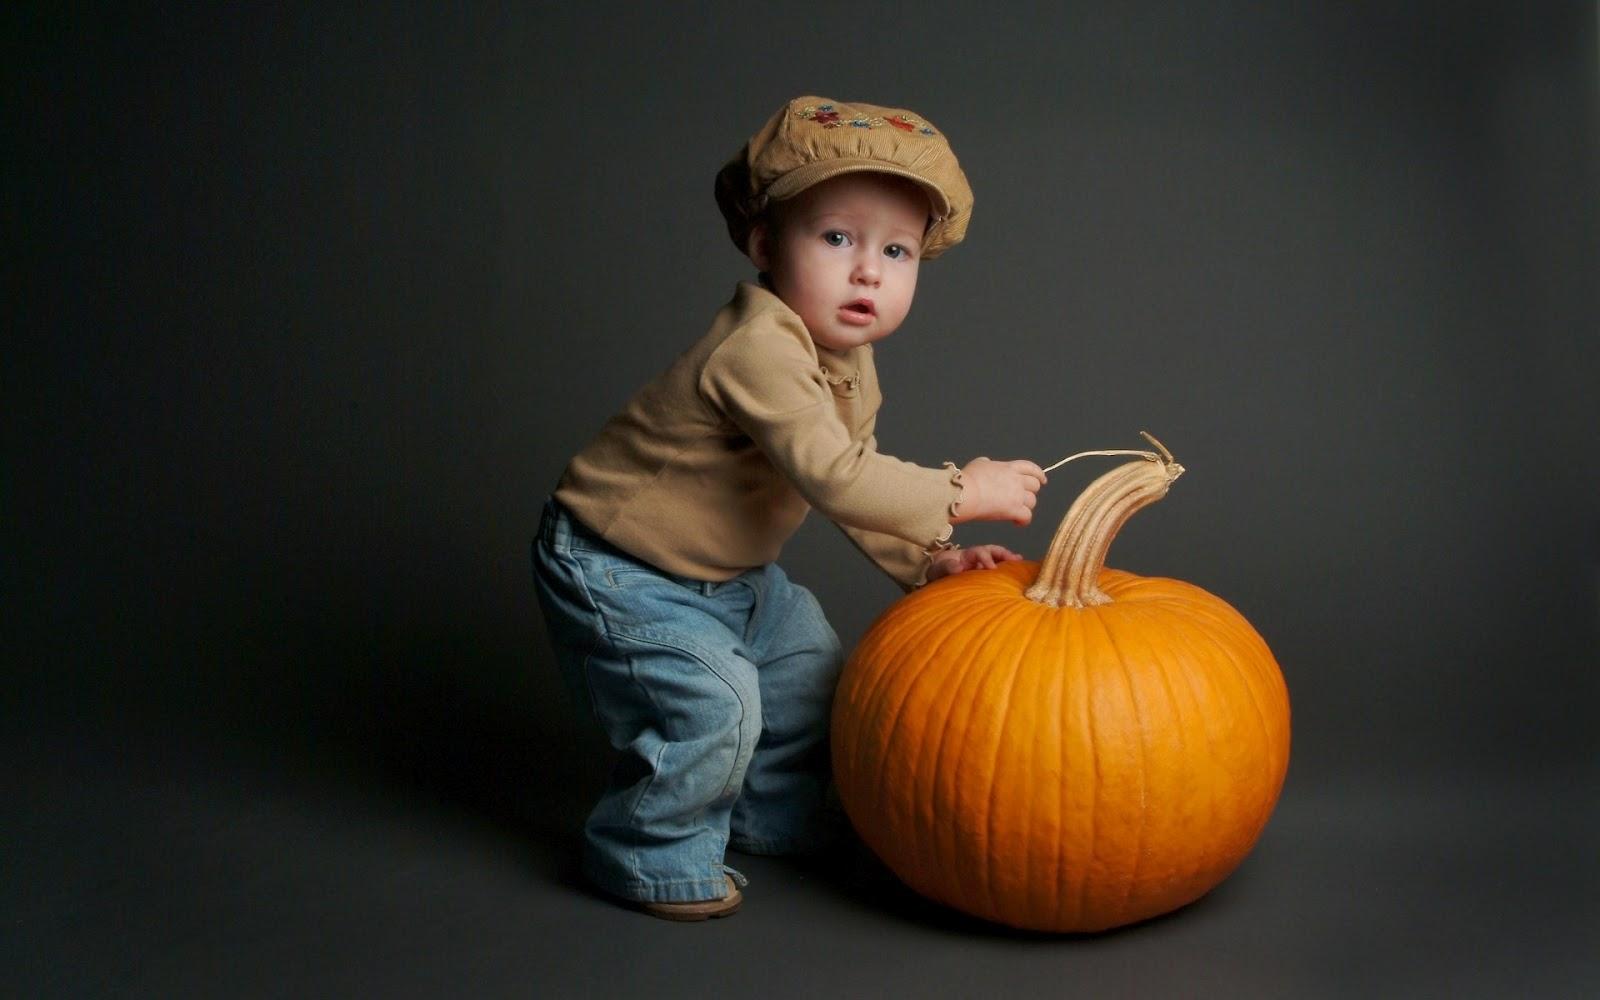 Wallpaper Cute Babies Hd Wallpapers: Baby Wallpaper Hd 1080p